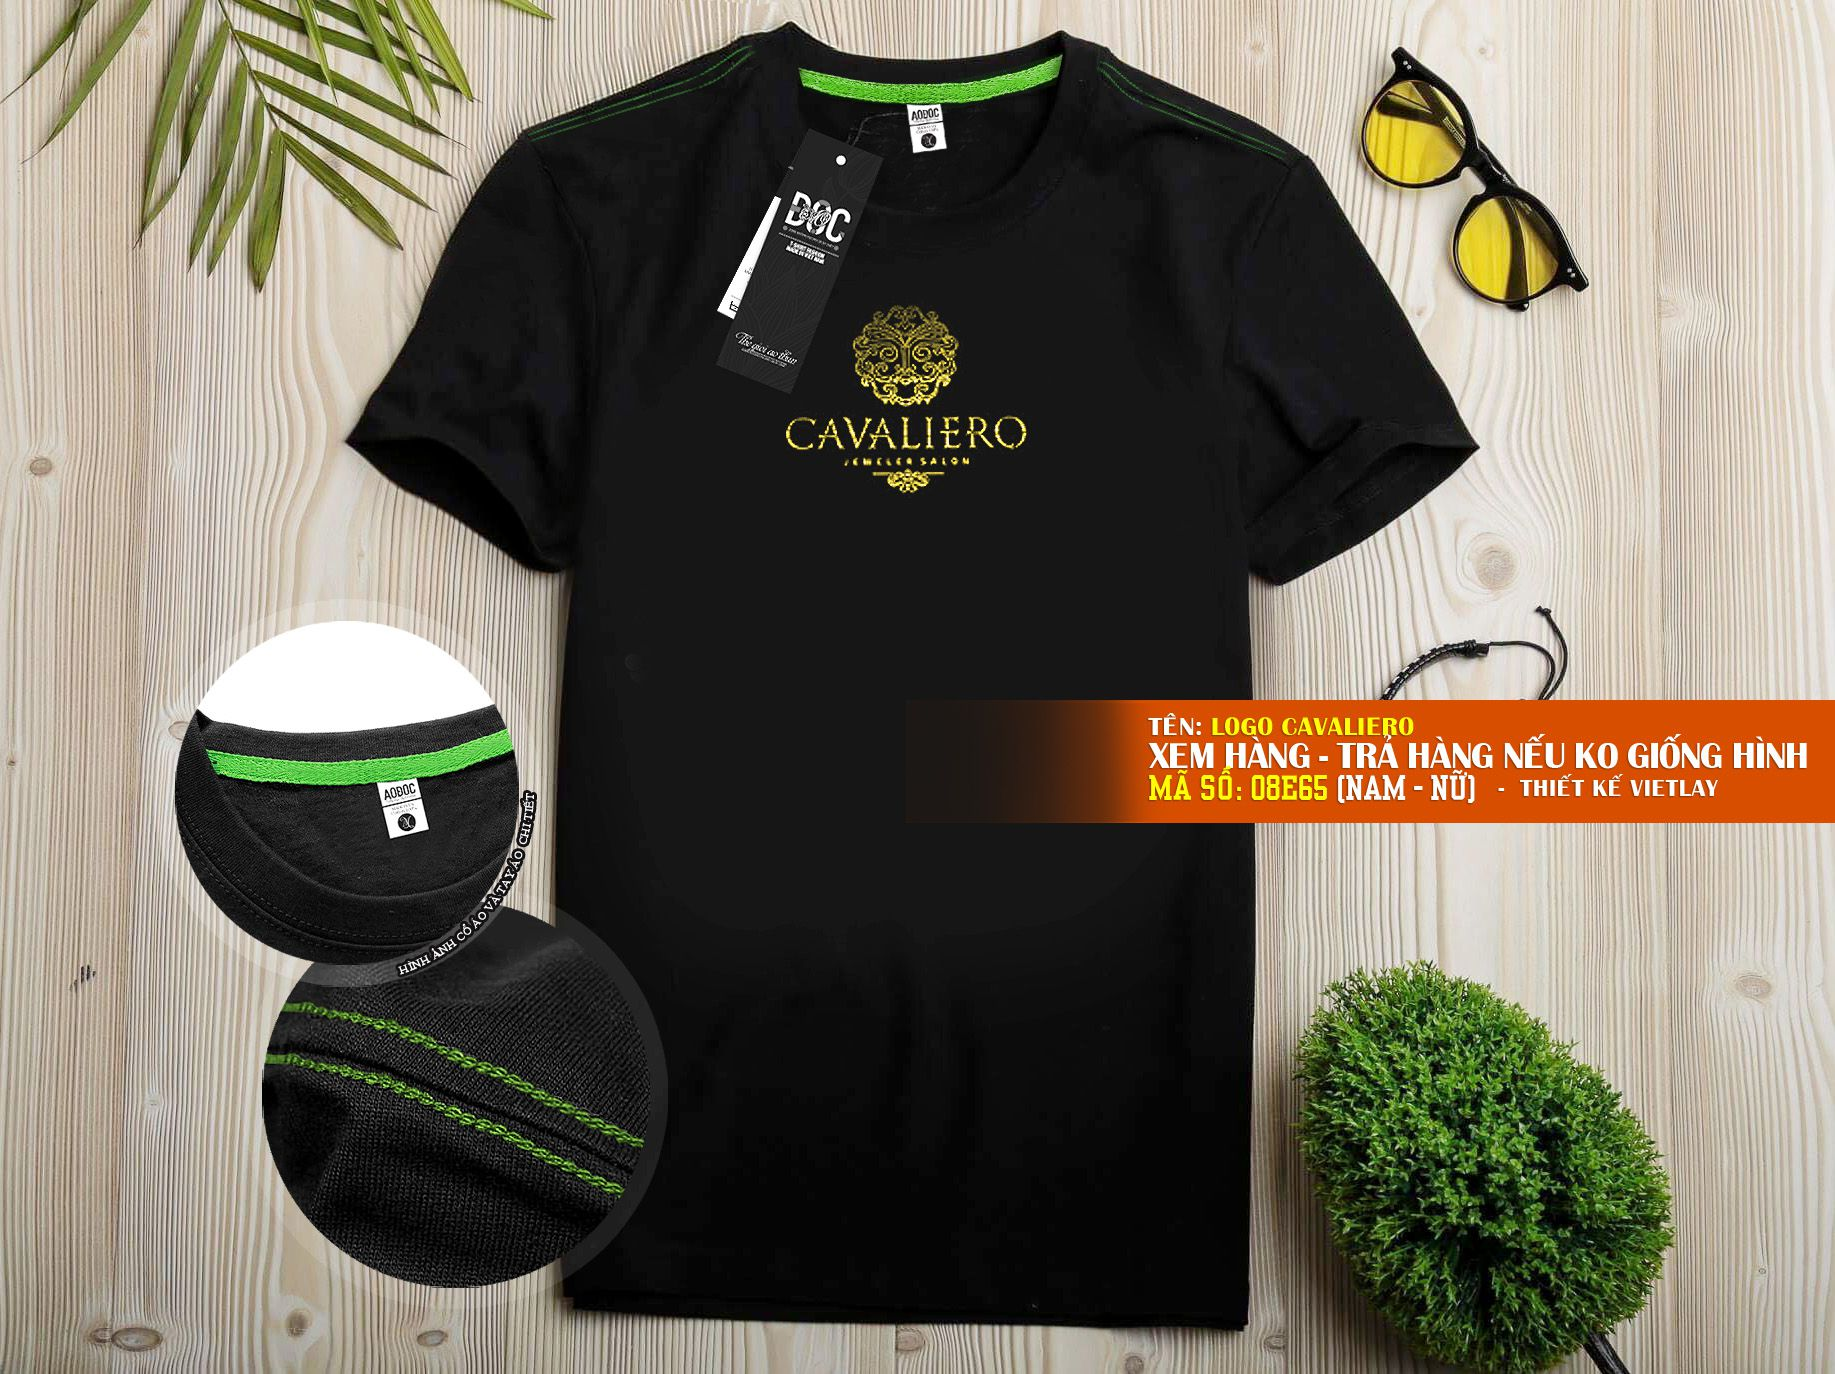 08E65 Cavaliero